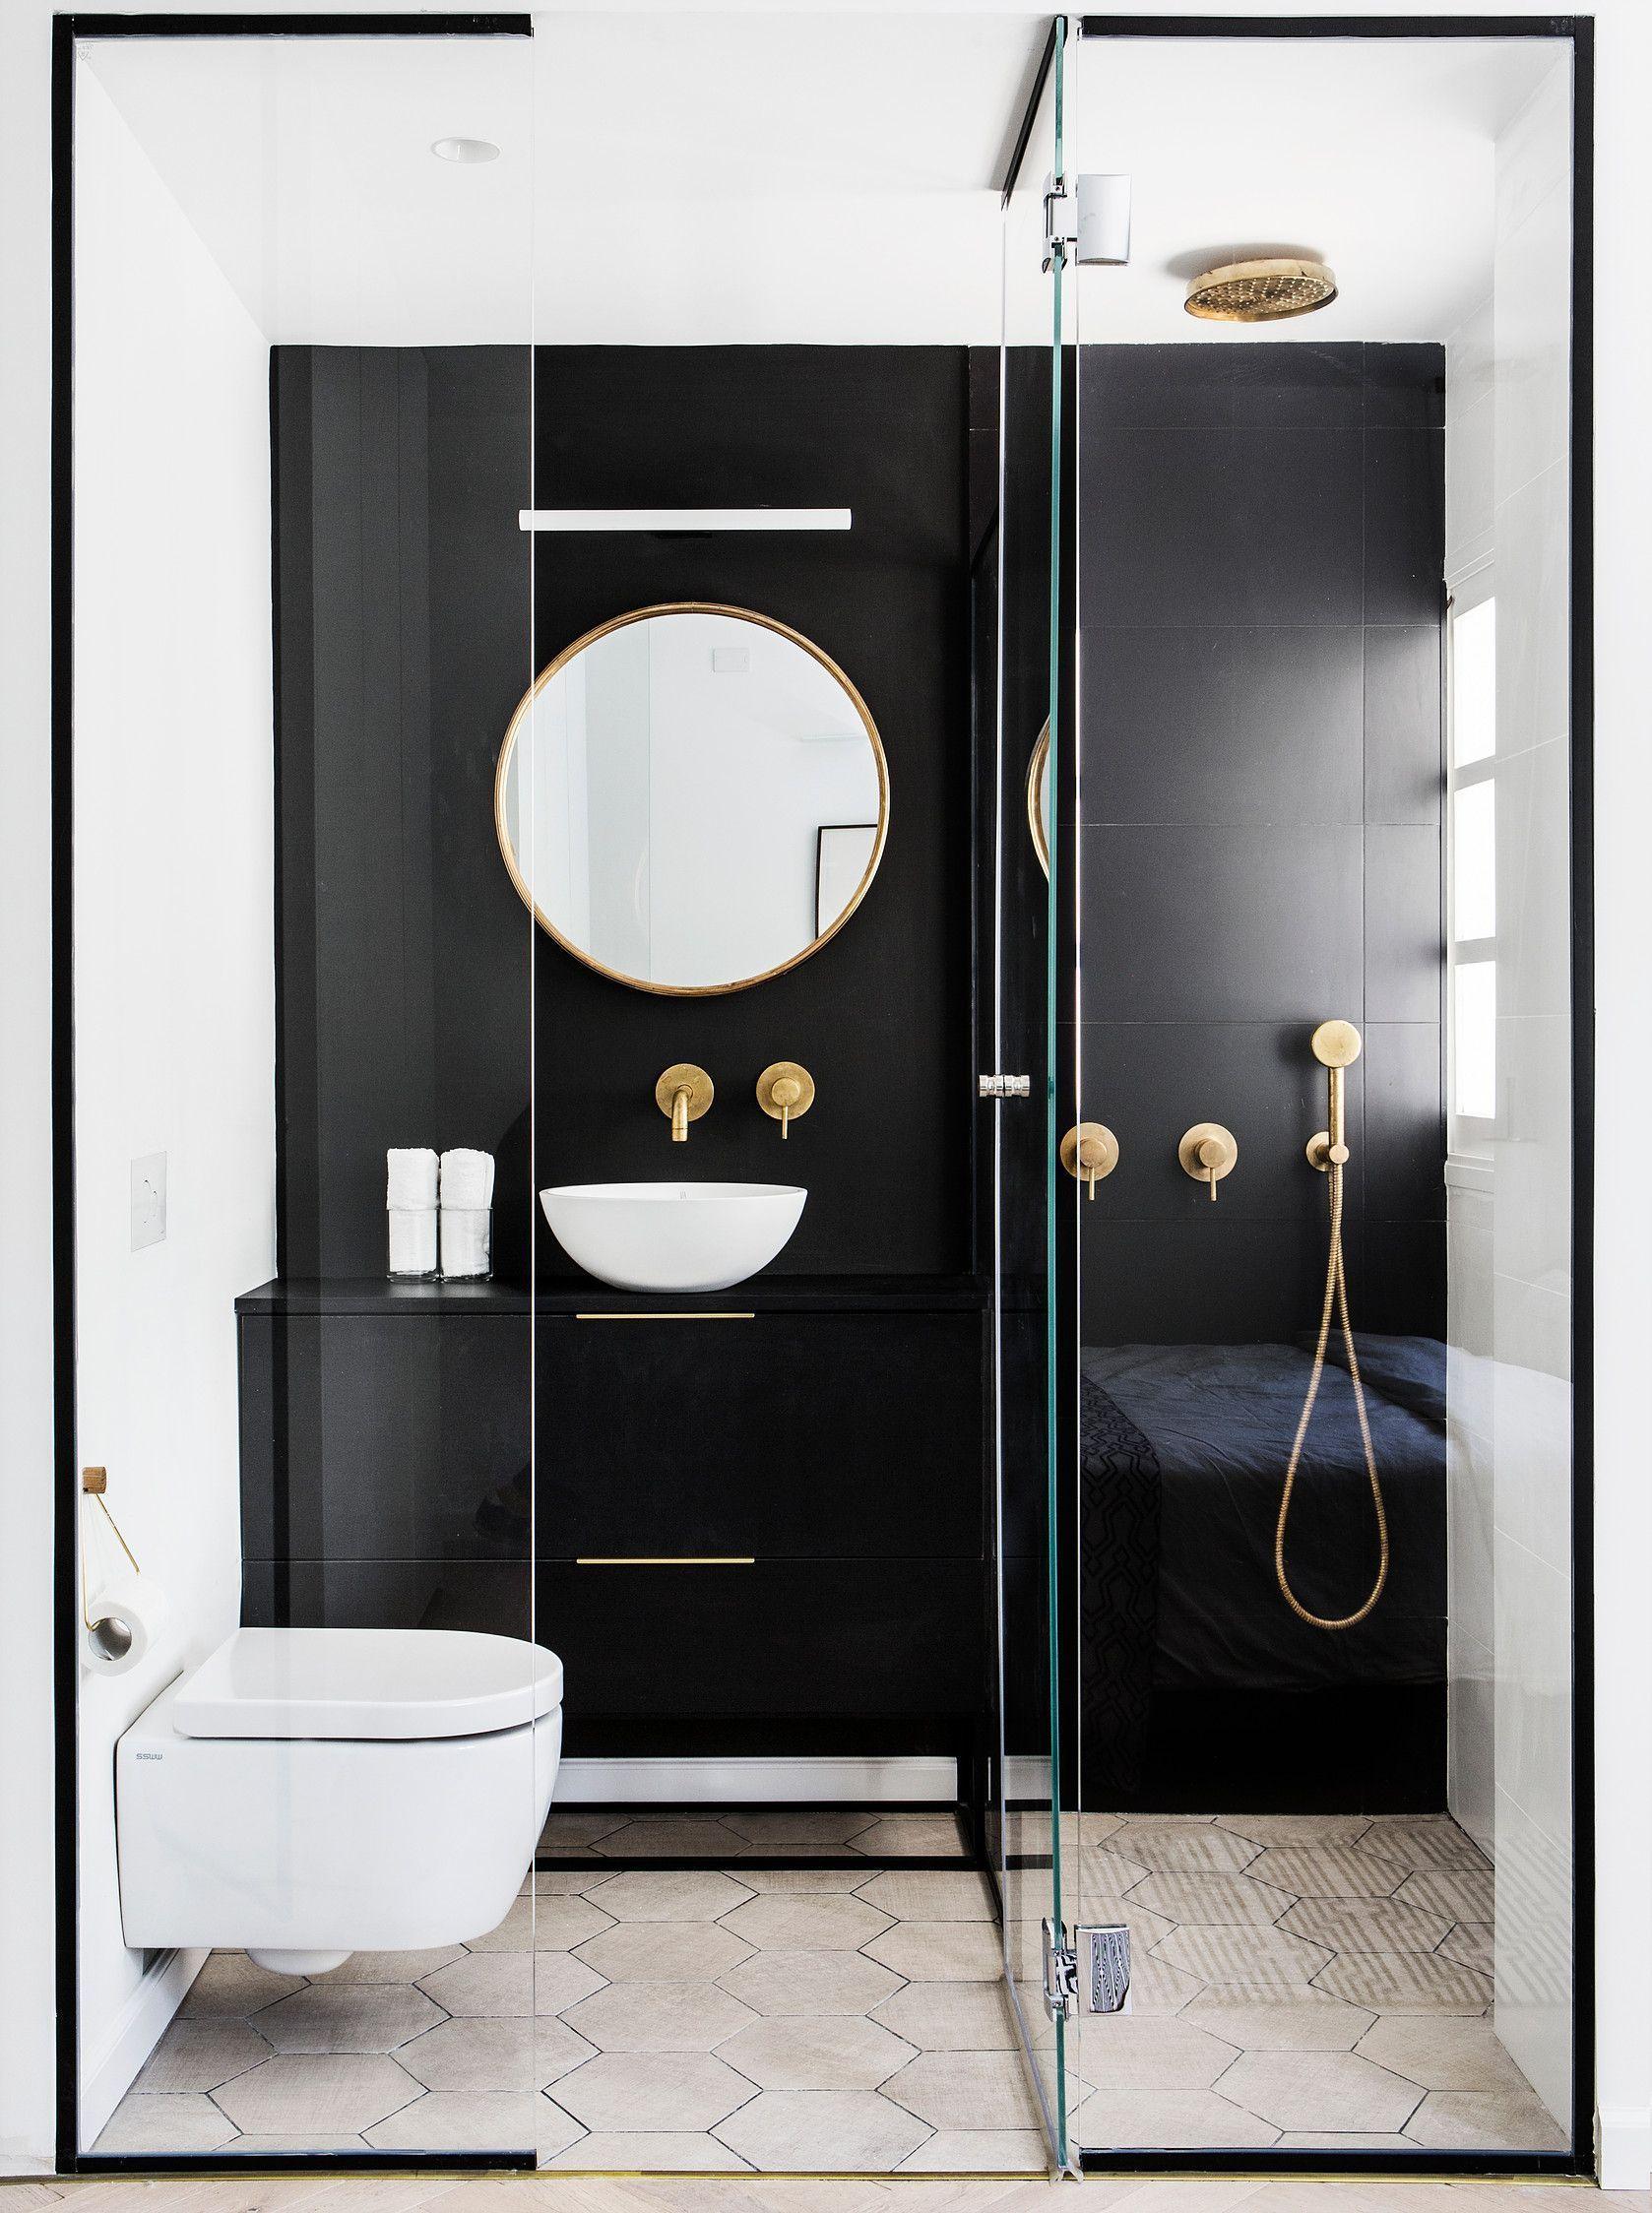 Luxury Bathroom Contrast interior design